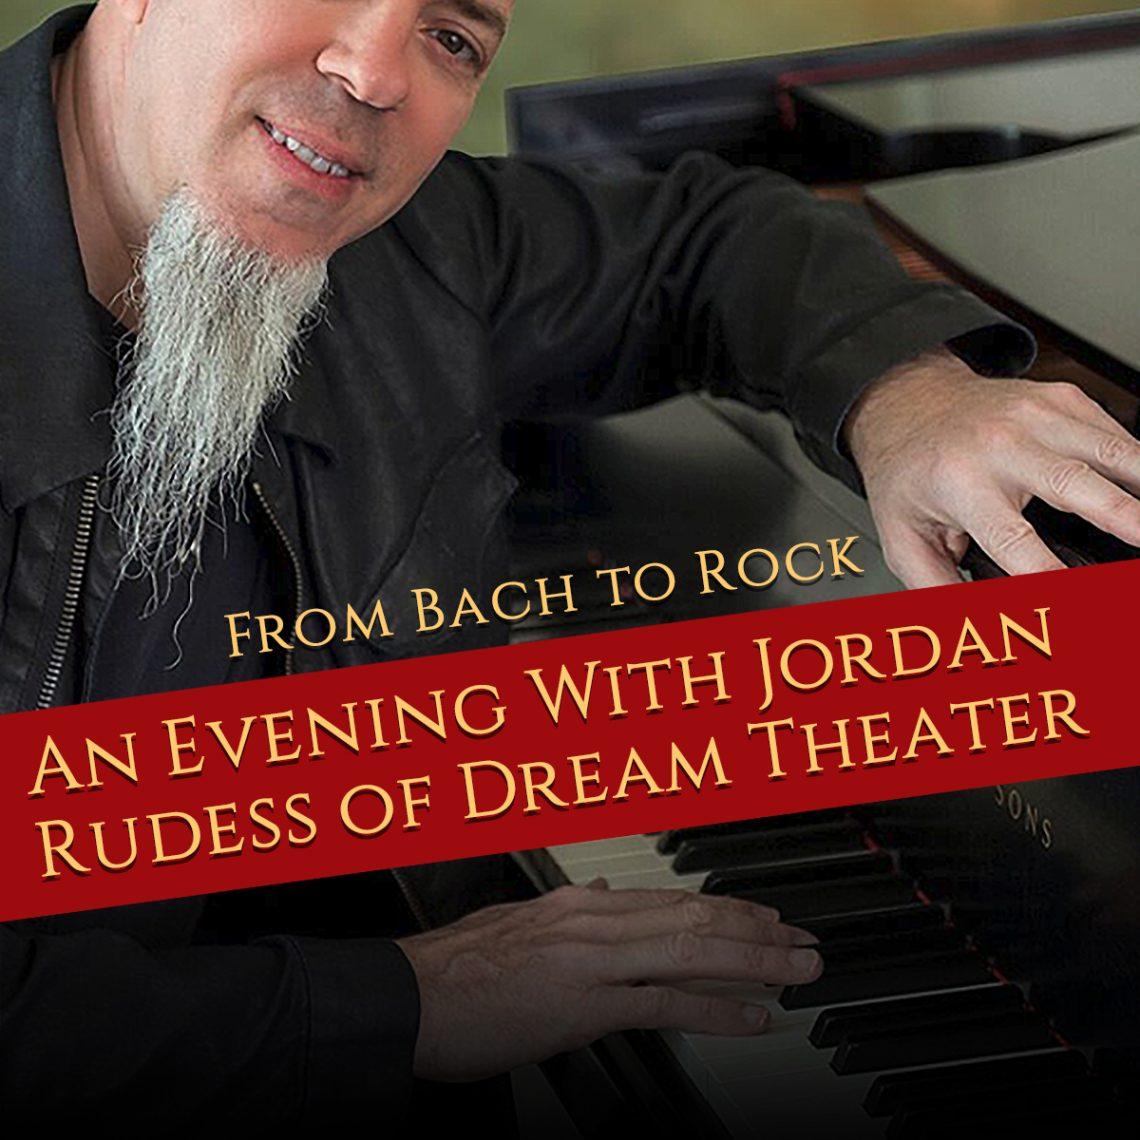 JORDAN RUDESS ANNOUNCES SOLO TOUR, JOHN PETRUCCI HEADS TO EUROPE WITH G3